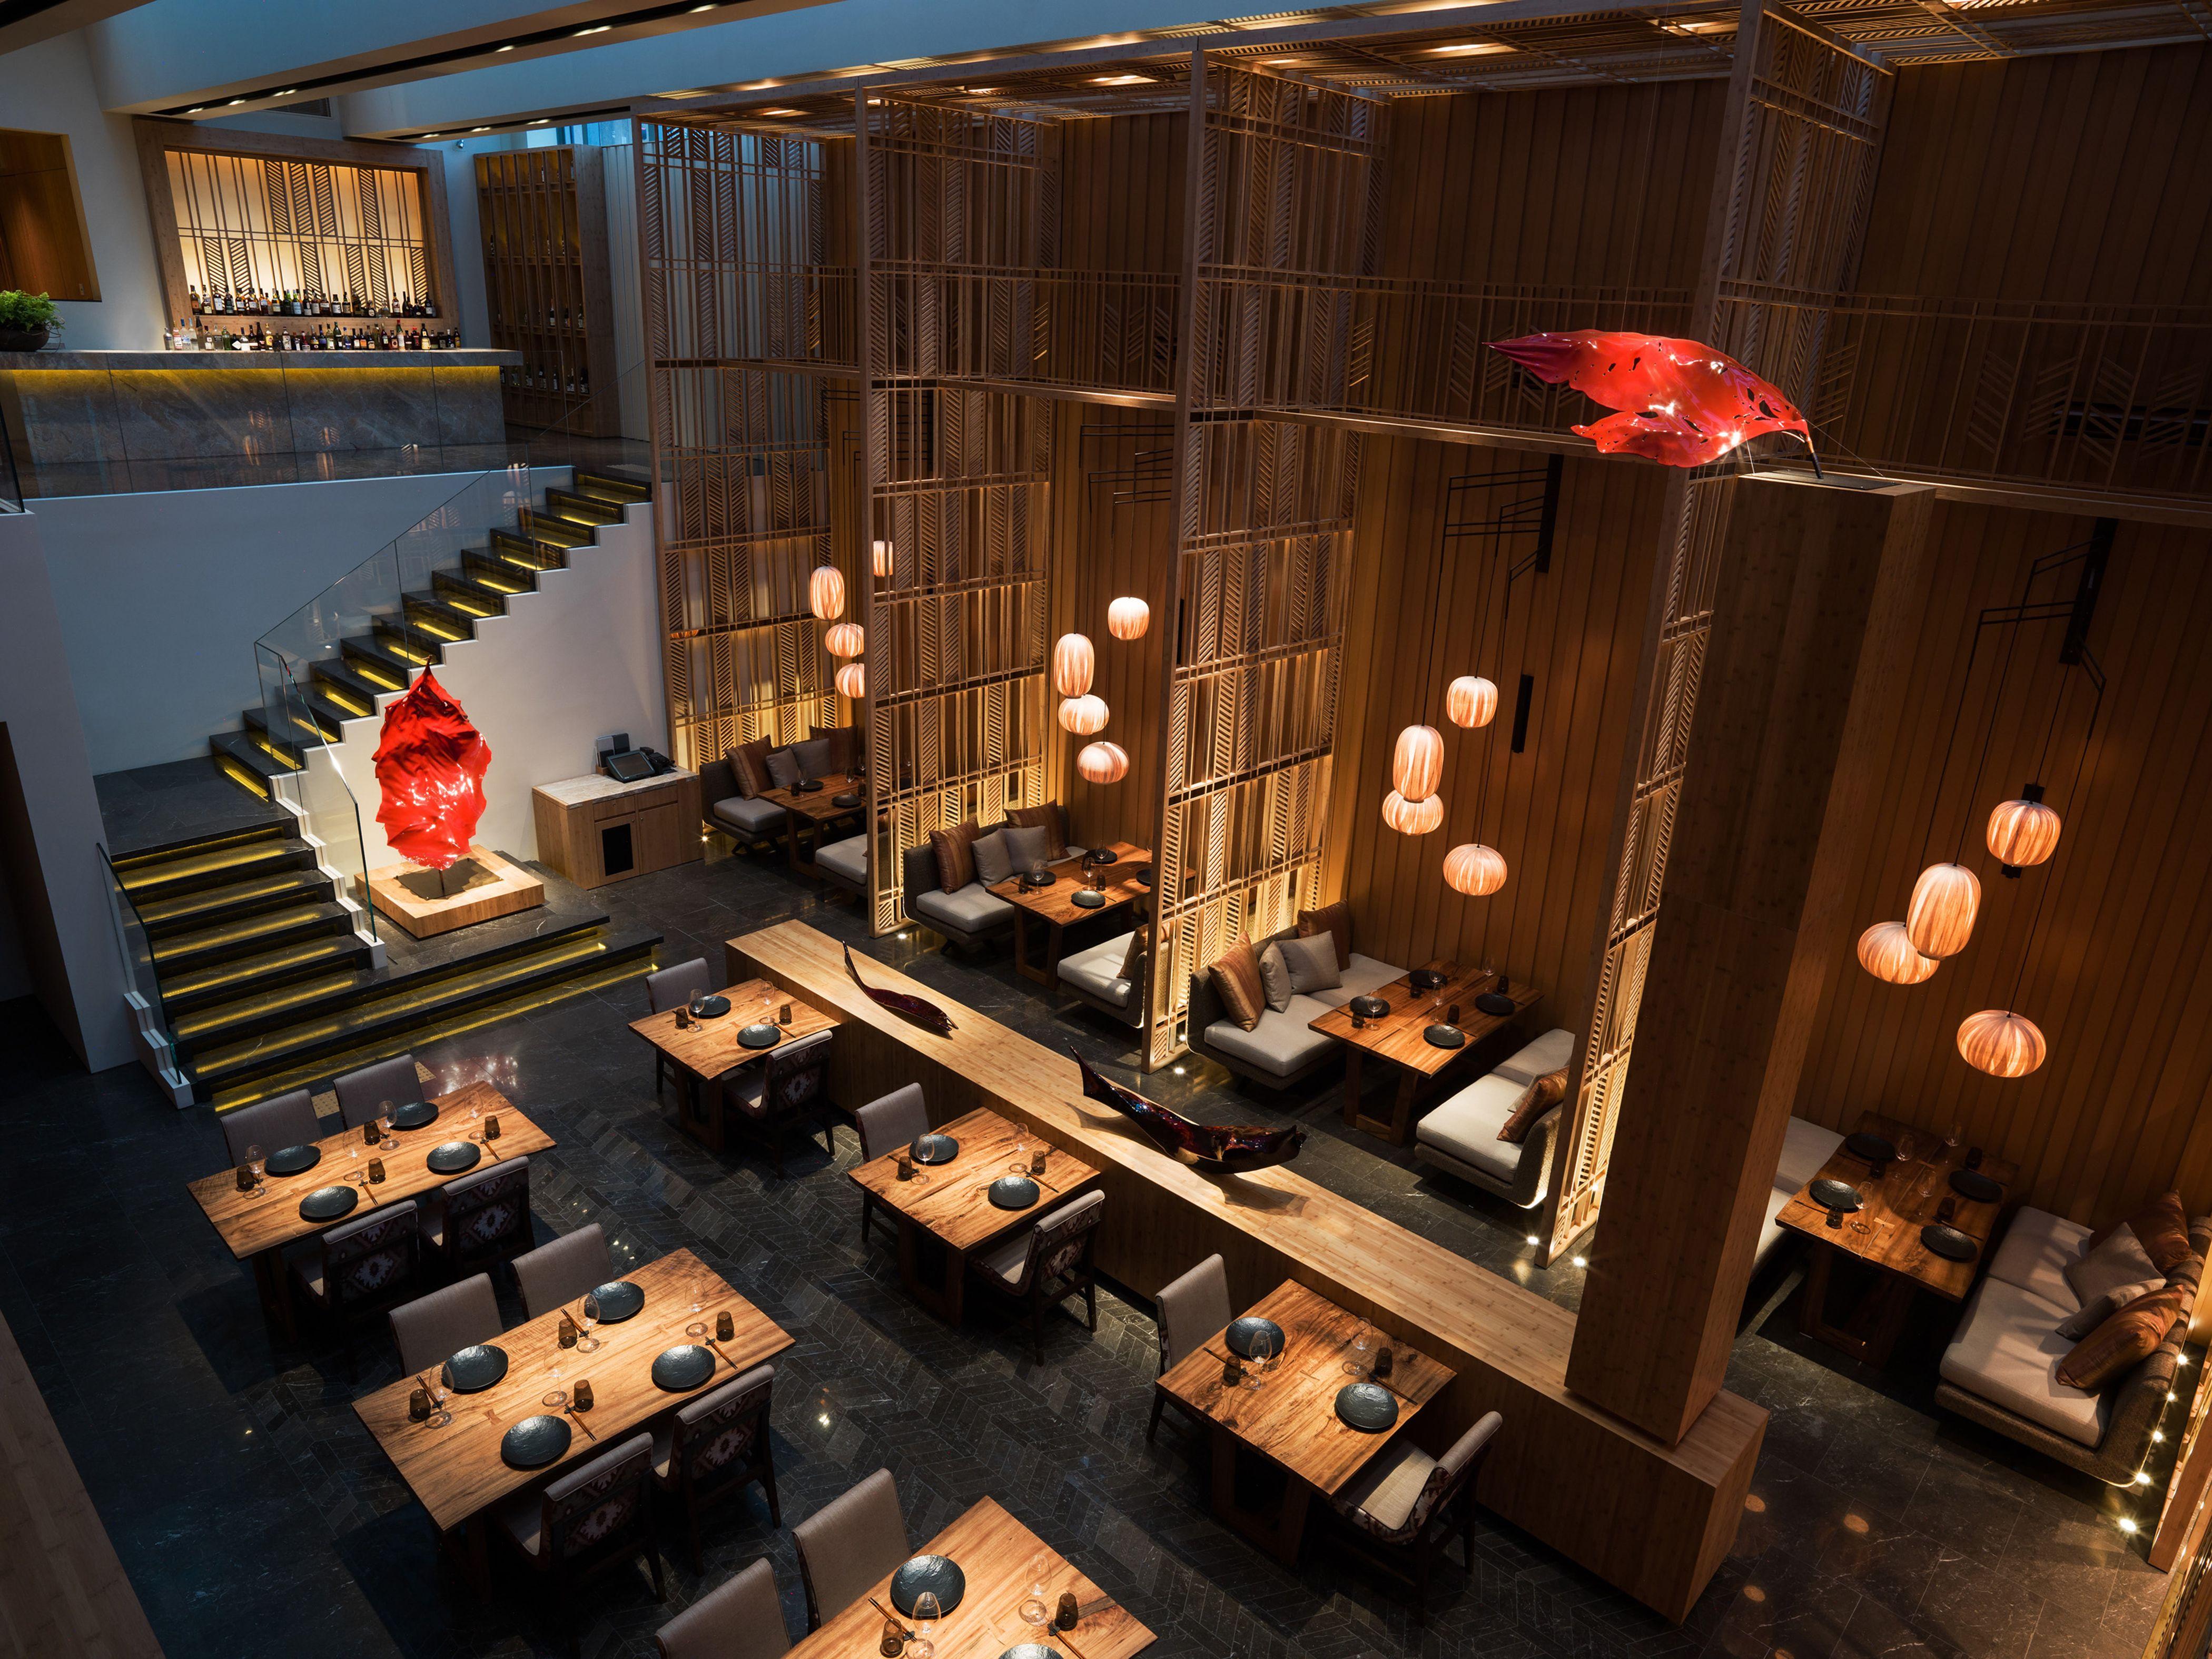 Kioku Anese Restaurant At Four Seasons Hotel Seoul Designed By Afso Hospitalitydesignmagazine Hospitalitydesign Hdmag Projects Design